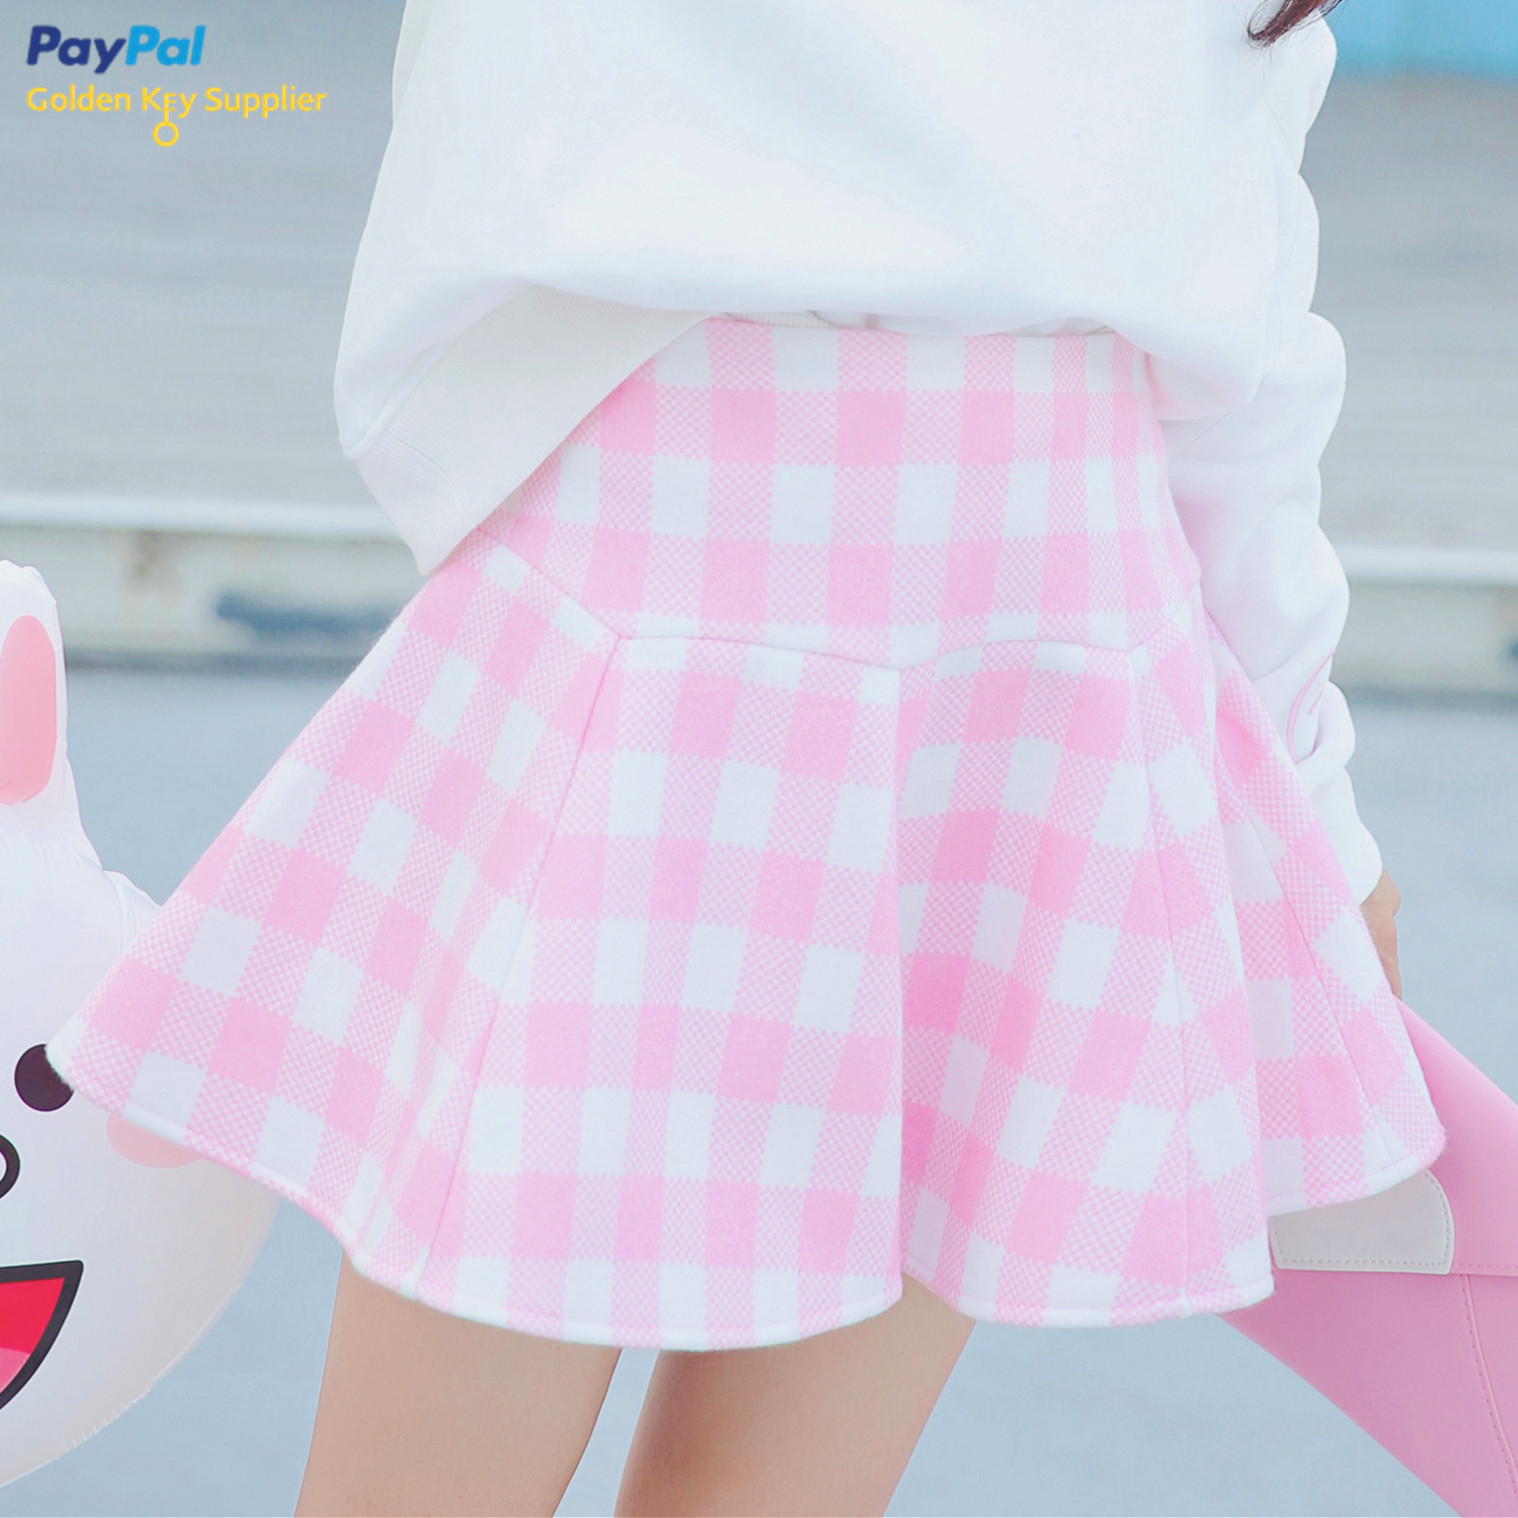 FREE DHL SHIPPING Sweet Plaid Pink Skirt